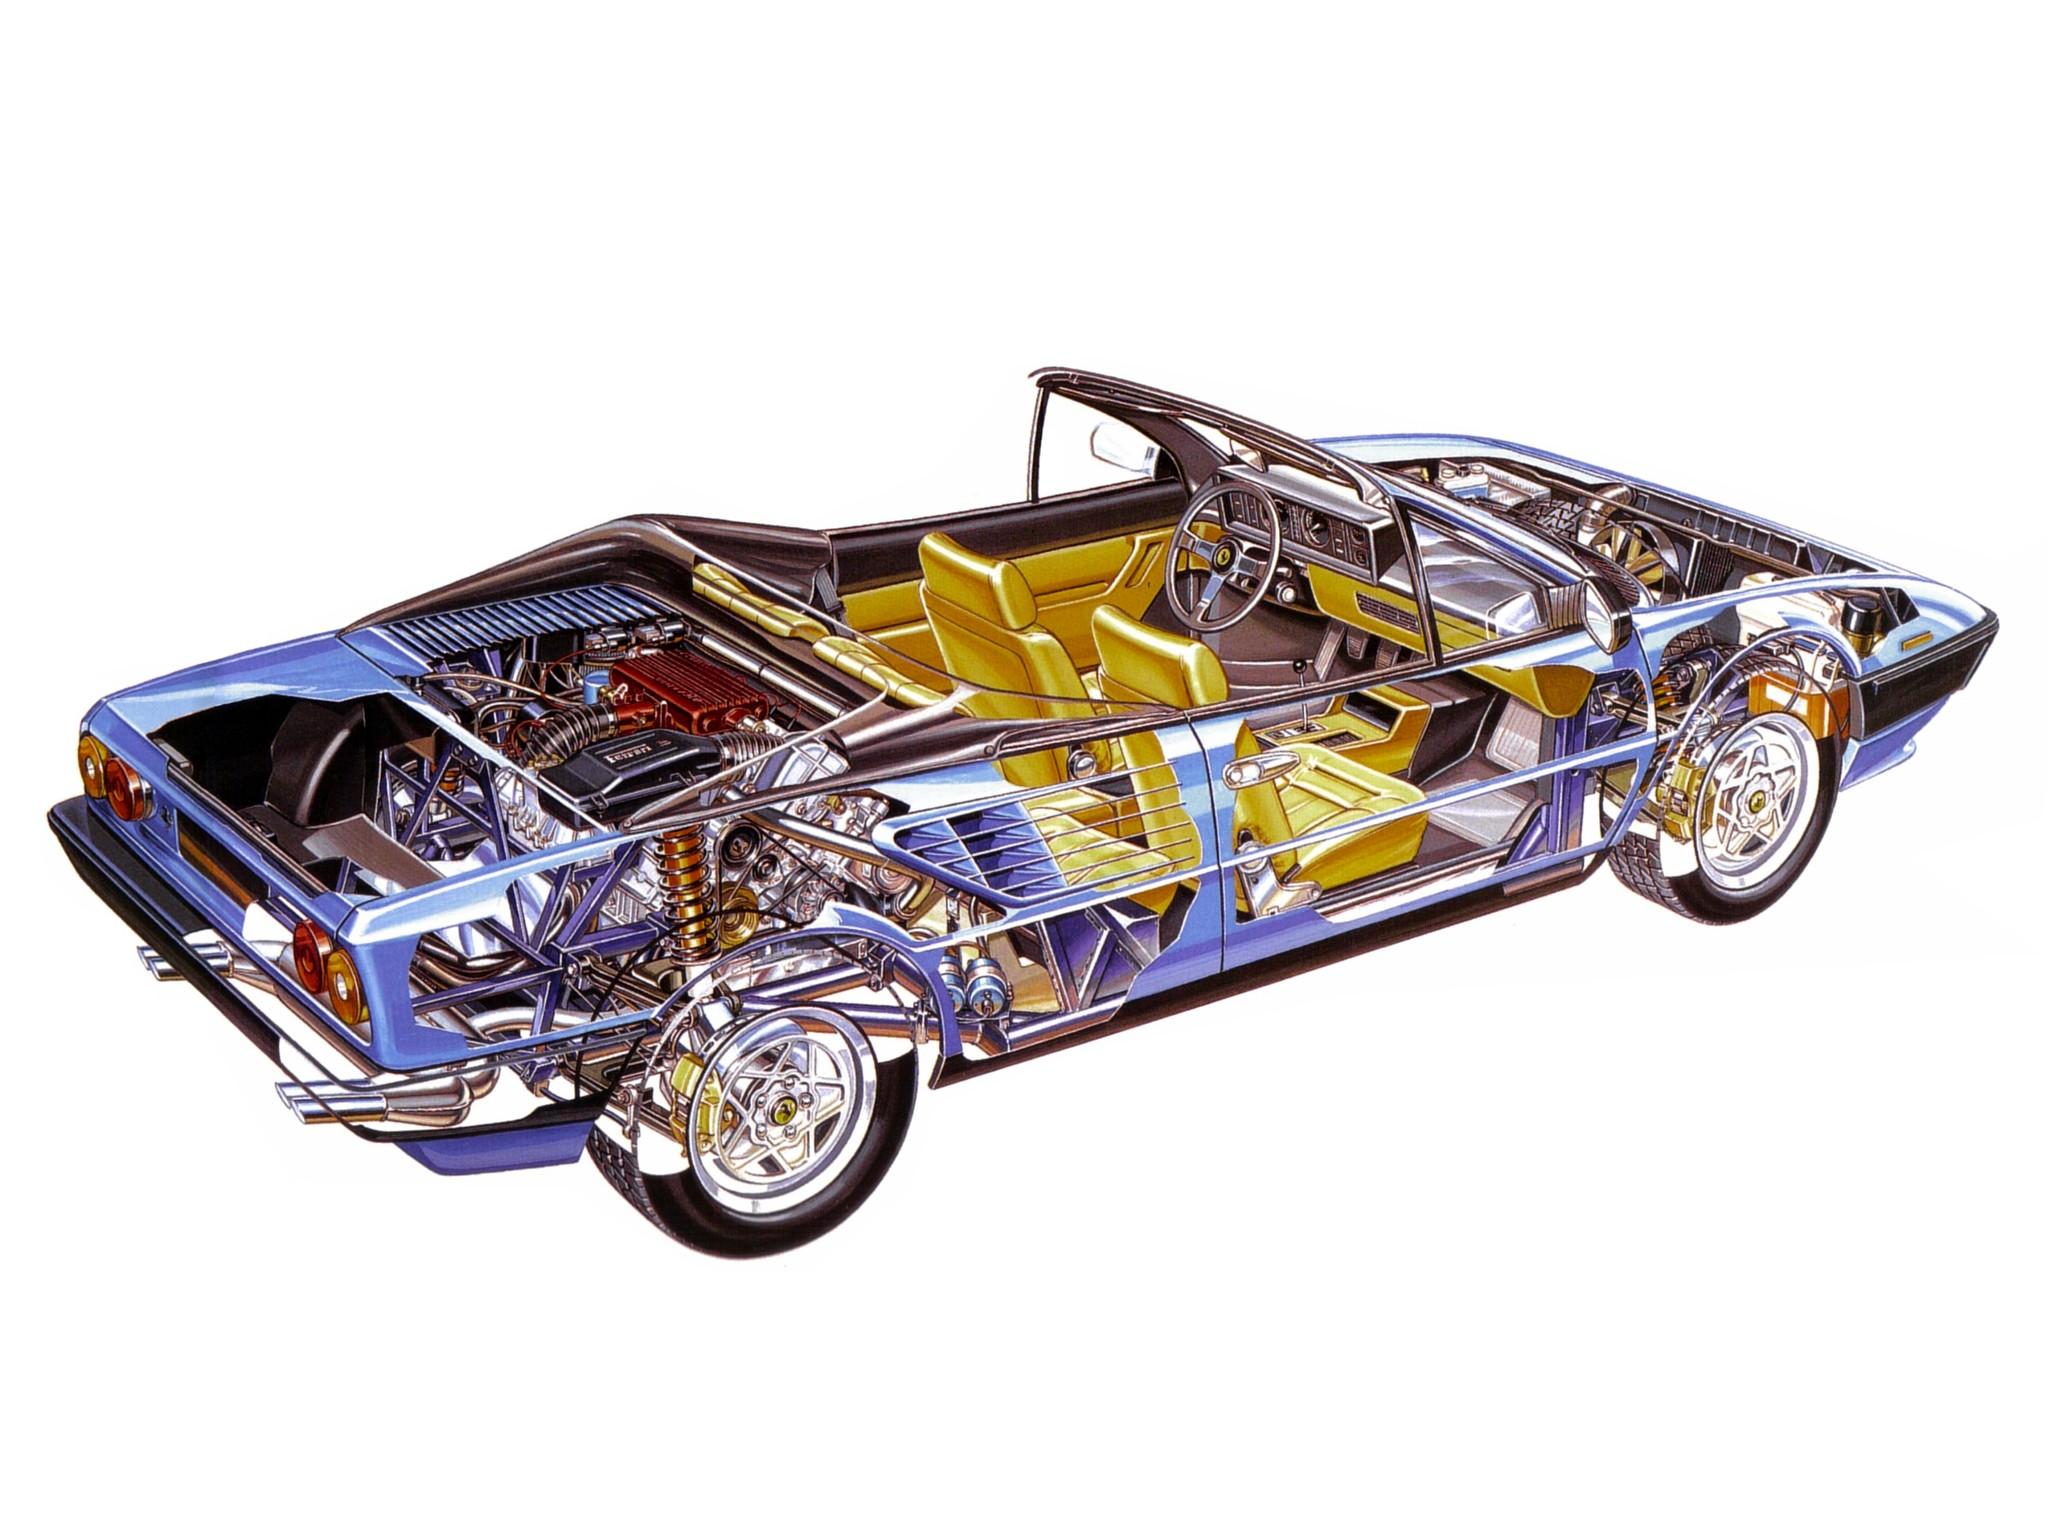 ferrari mondial quattrovalvole cabriolet specs 1983. Black Bedroom Furniture Sets. Home Design Ideas